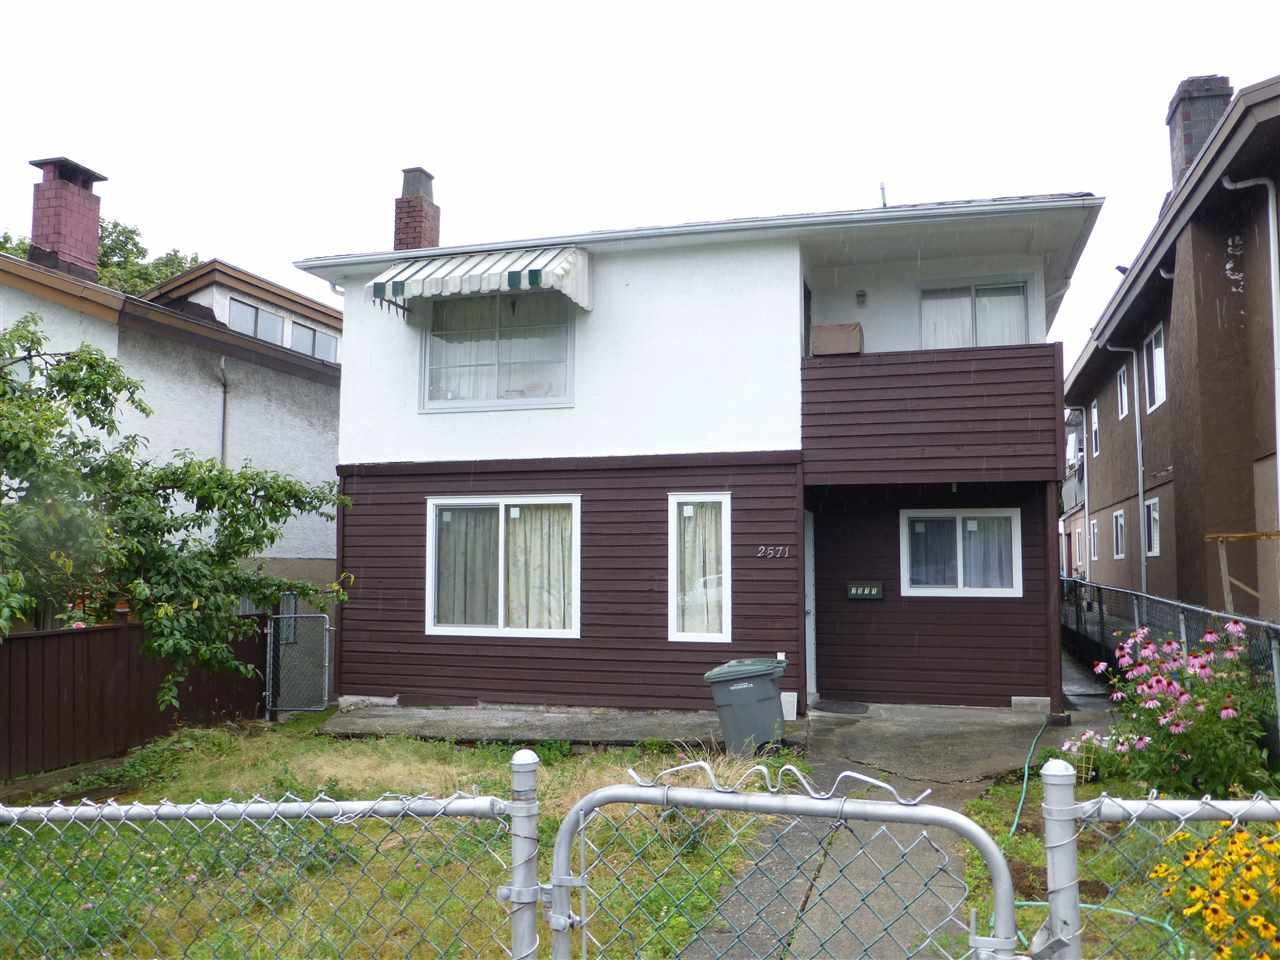 Main Photo: 2571 RENFREW Street in Vancouver: Renfrew VE House for sale (Vancouver East)  : MLS®# R2085901